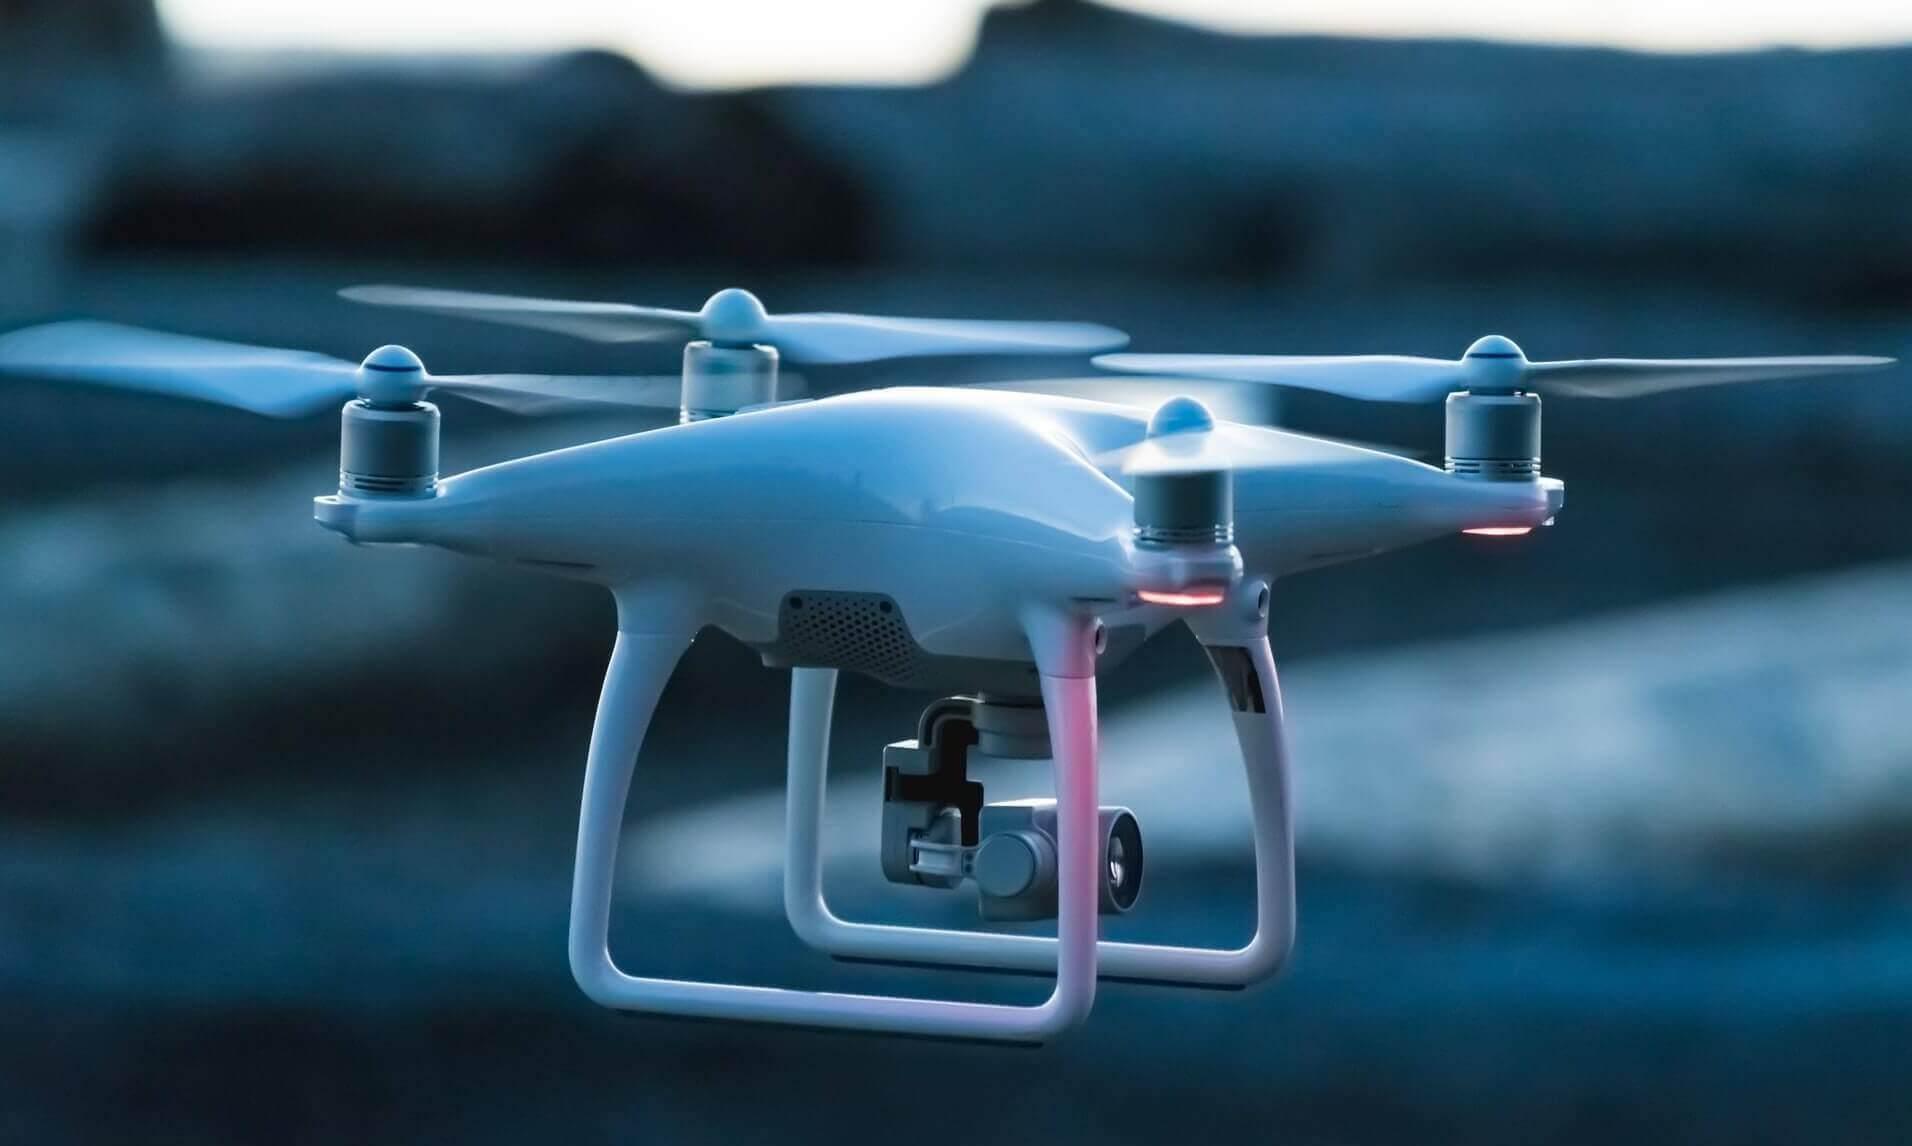 visual Drone inspection | drone inspection | drones | equinox's drones